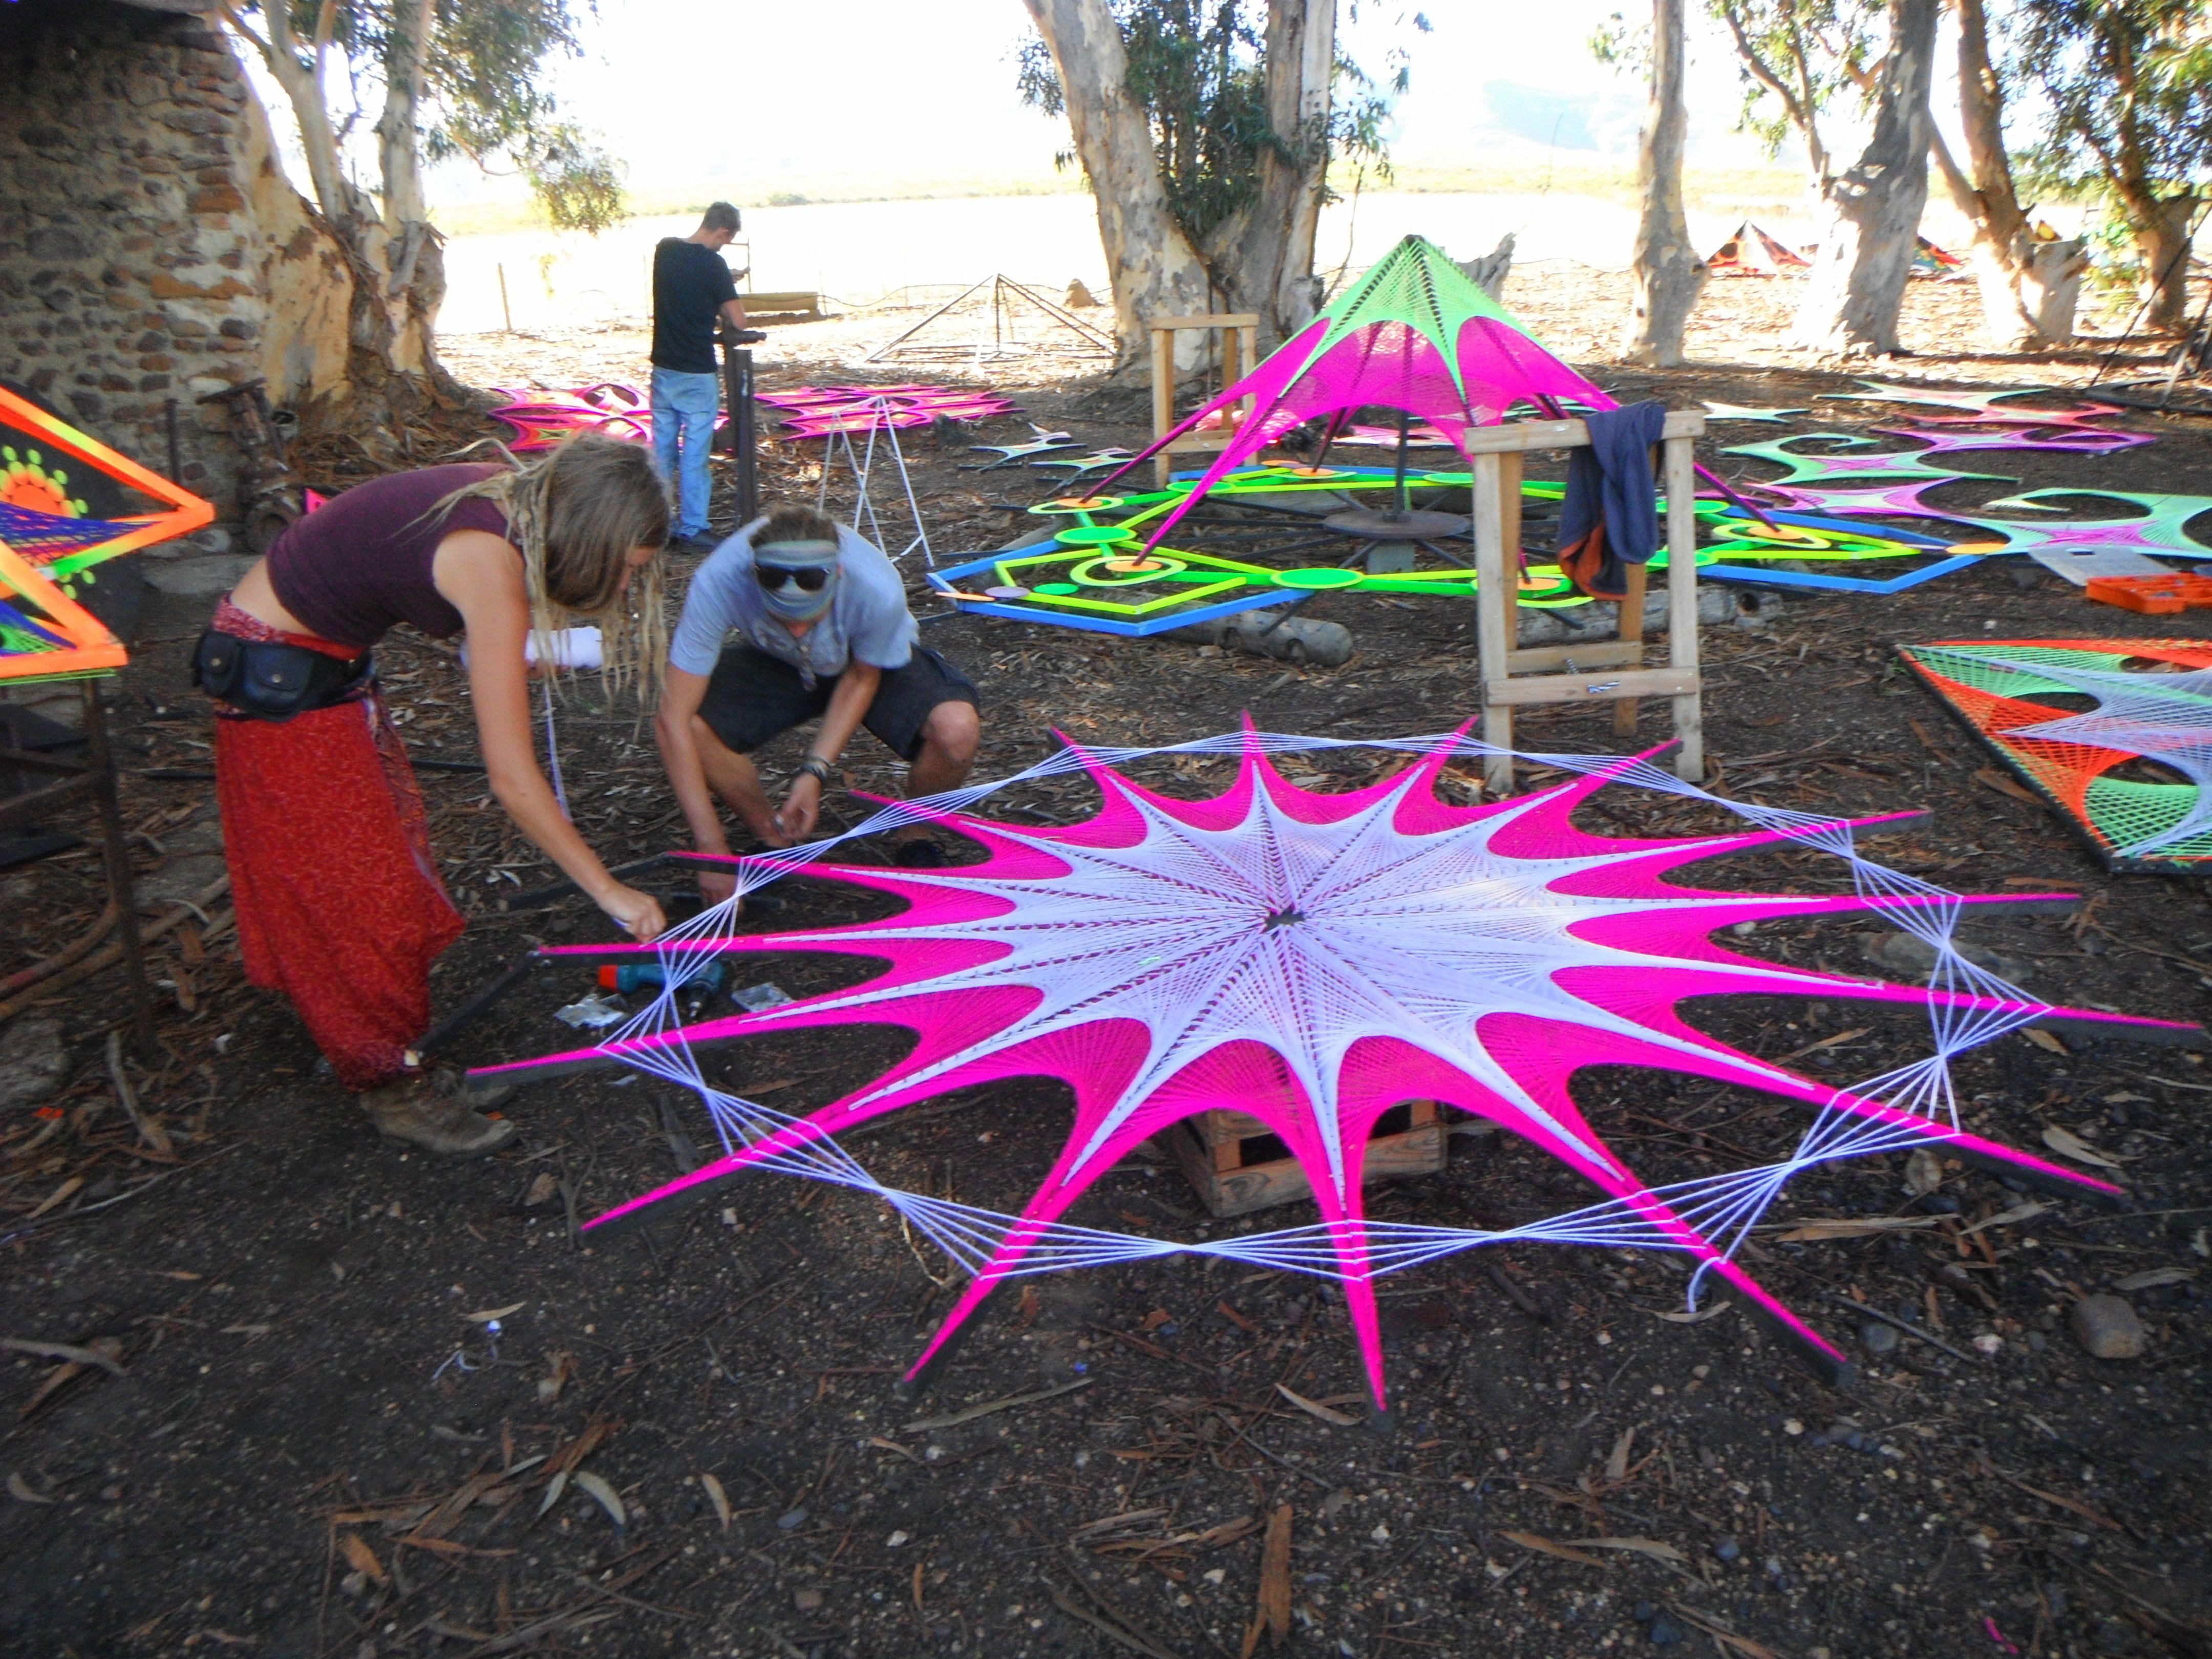 Art Décor: String Art, Festival Decor, Psychedelic, UV Active, Taken